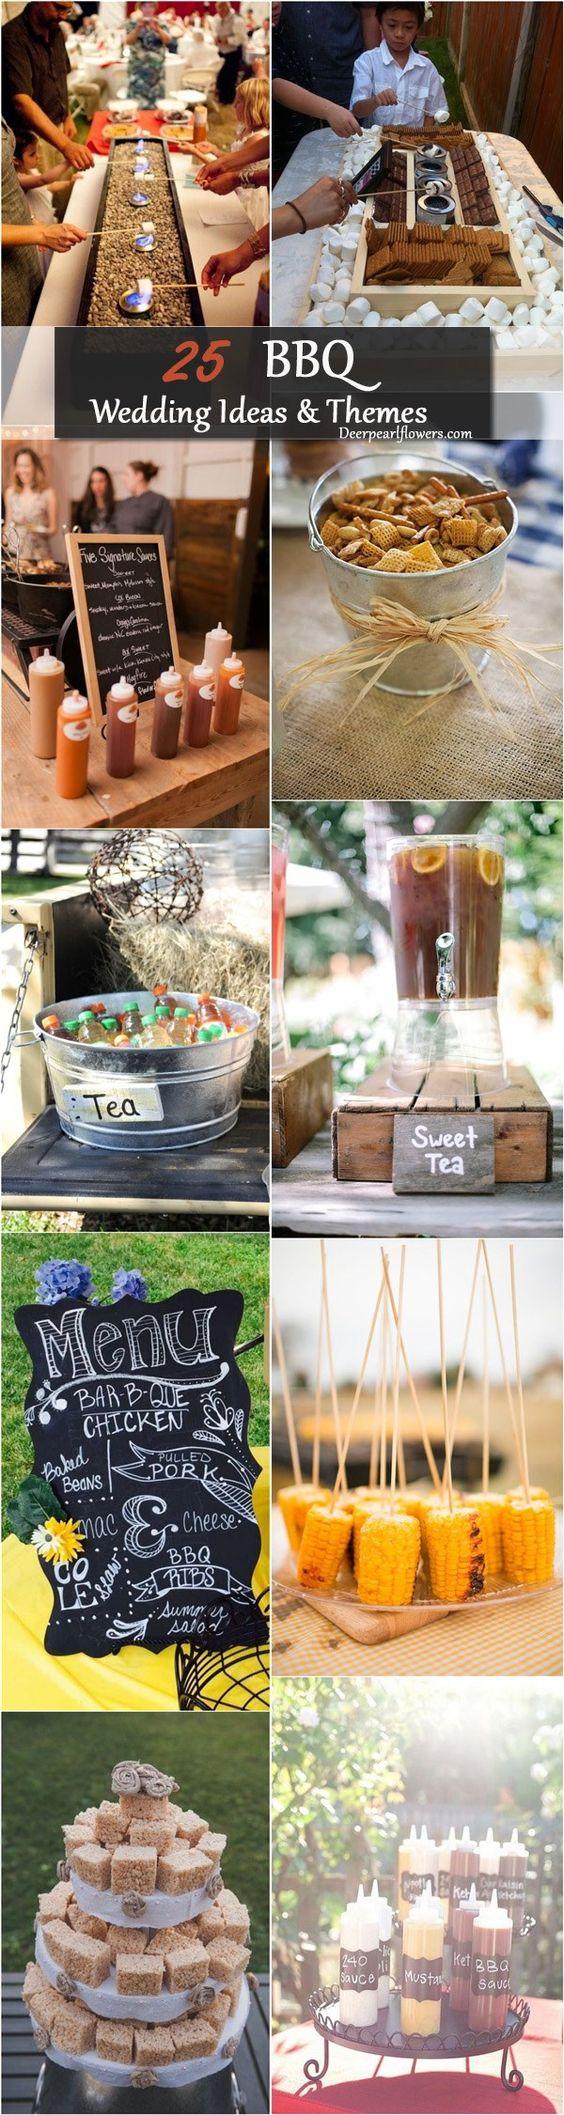 Rustic BBQ Barbecue Wedding Ideas / http://www.deerpearlflowers.com/barbecue-bbq-wedding-ideas/